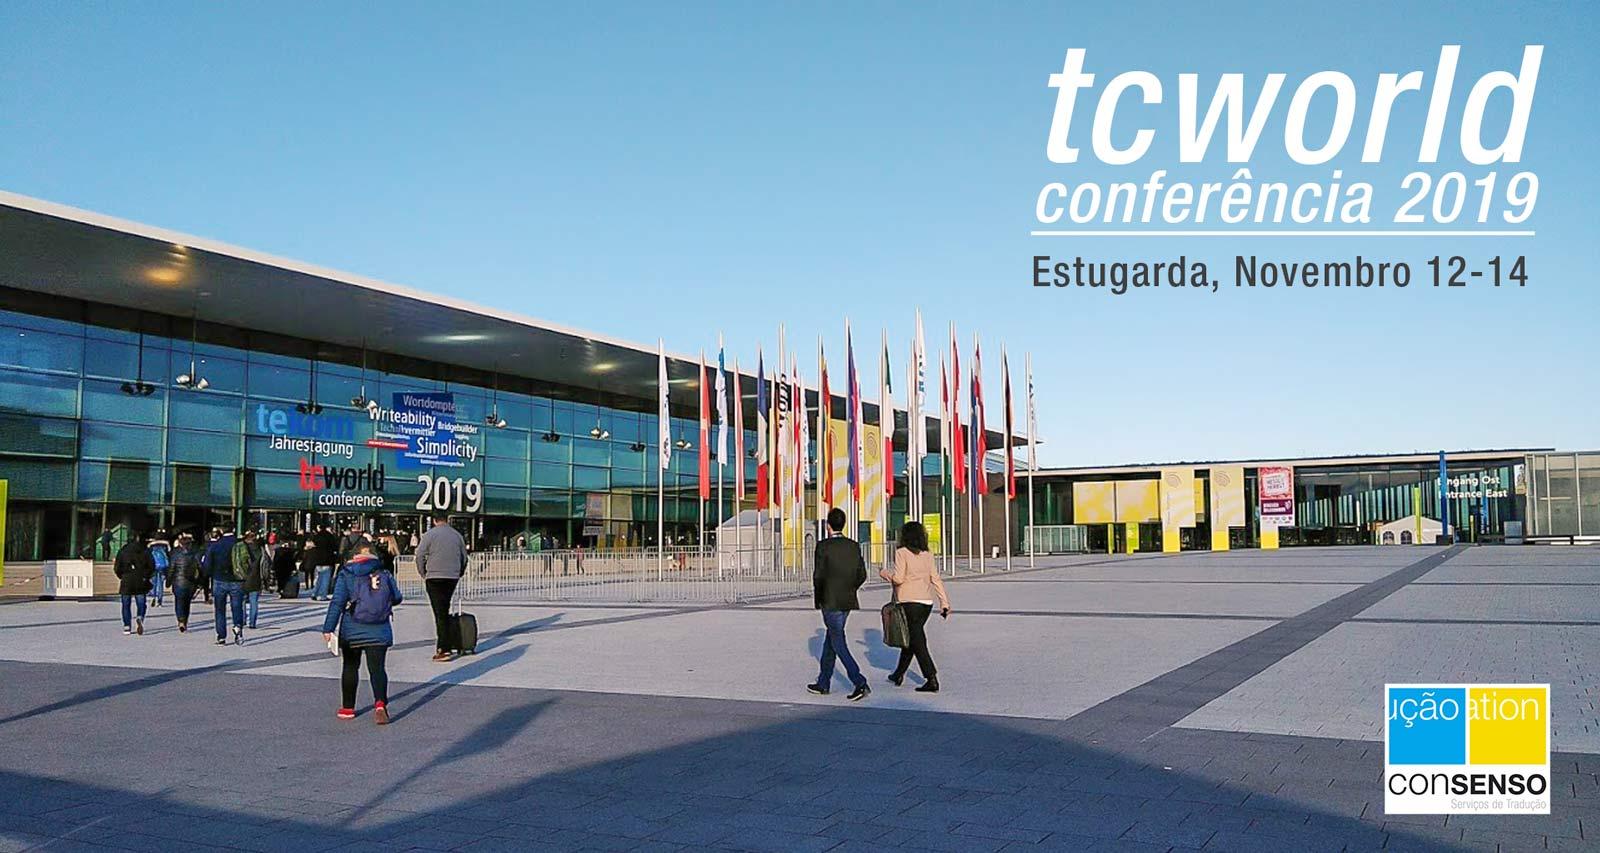 Tekom/tcworld conferência anual 2019